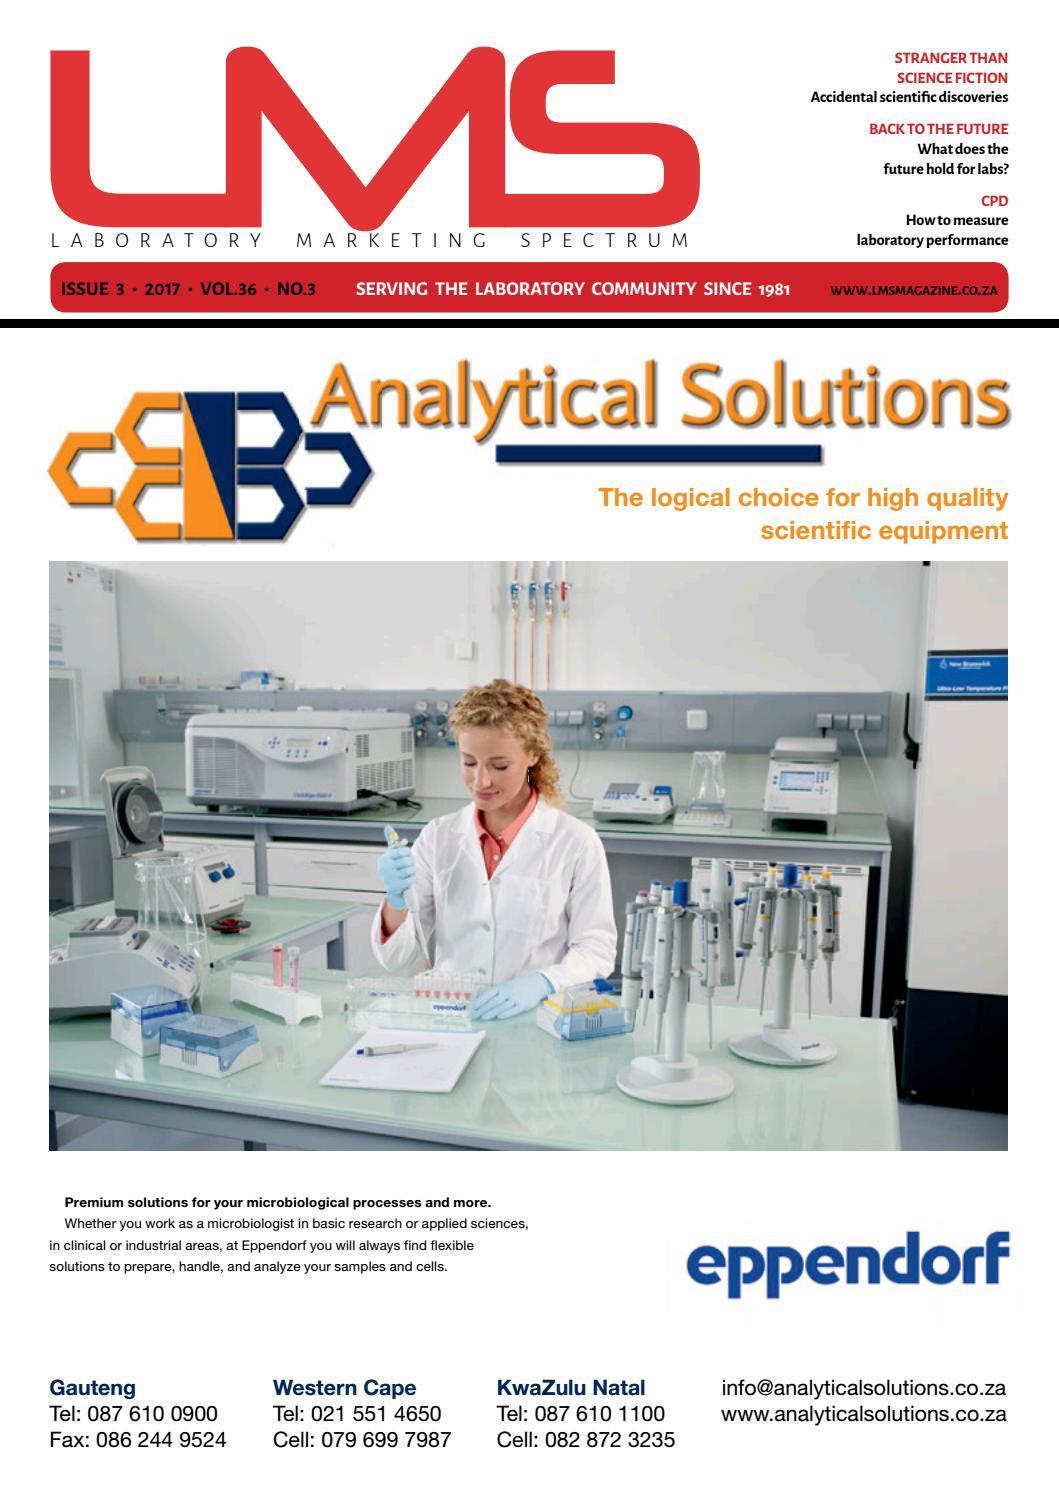 Laboratory Marketing Spectrum issue3 2017 by New Media B2B